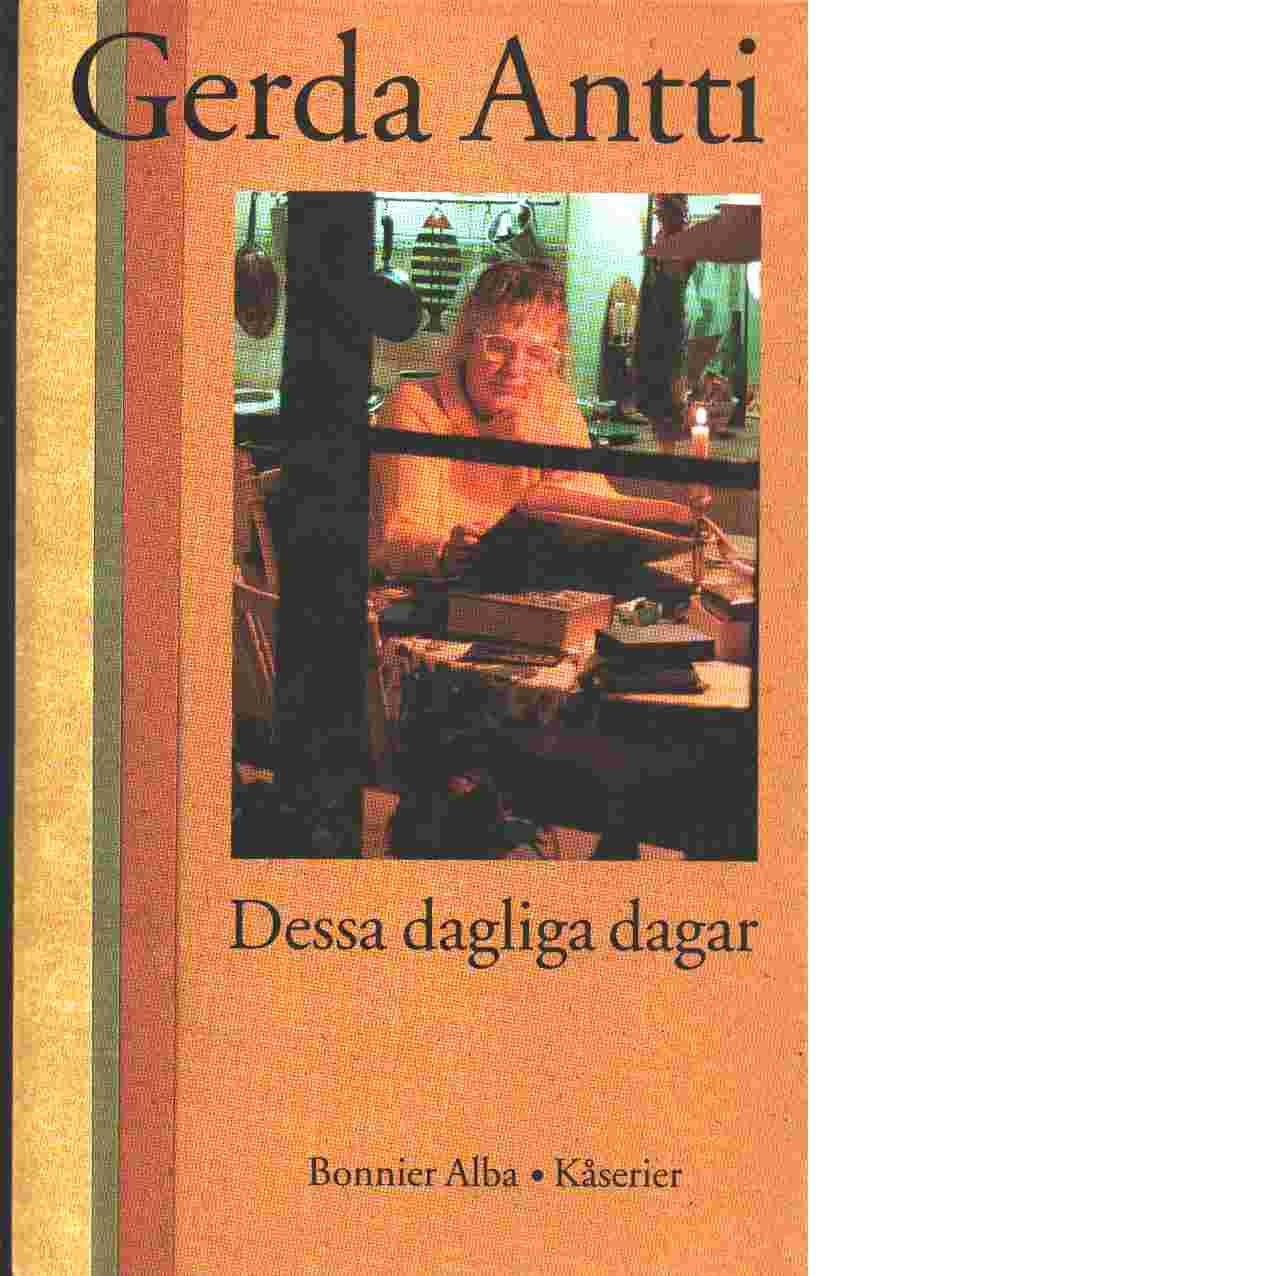 Dessa dagliga dagar - Antti, Gerda